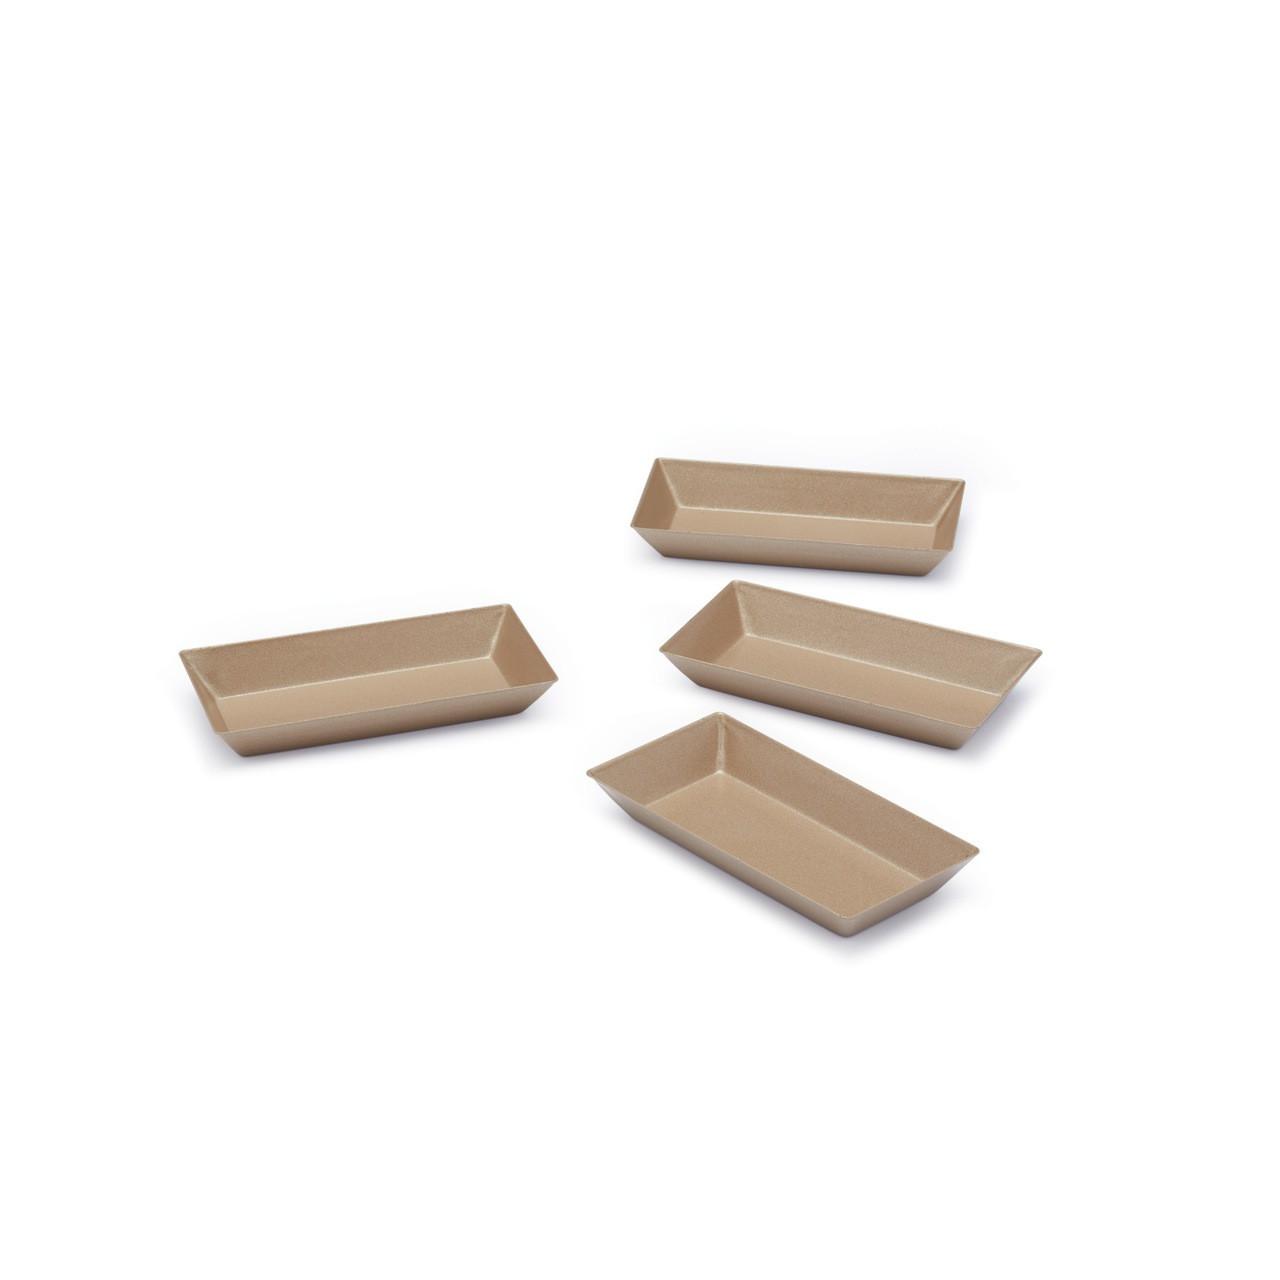 Paul Hollywood Set of 4 Non-Stick Mini Rectangular Baking Tins